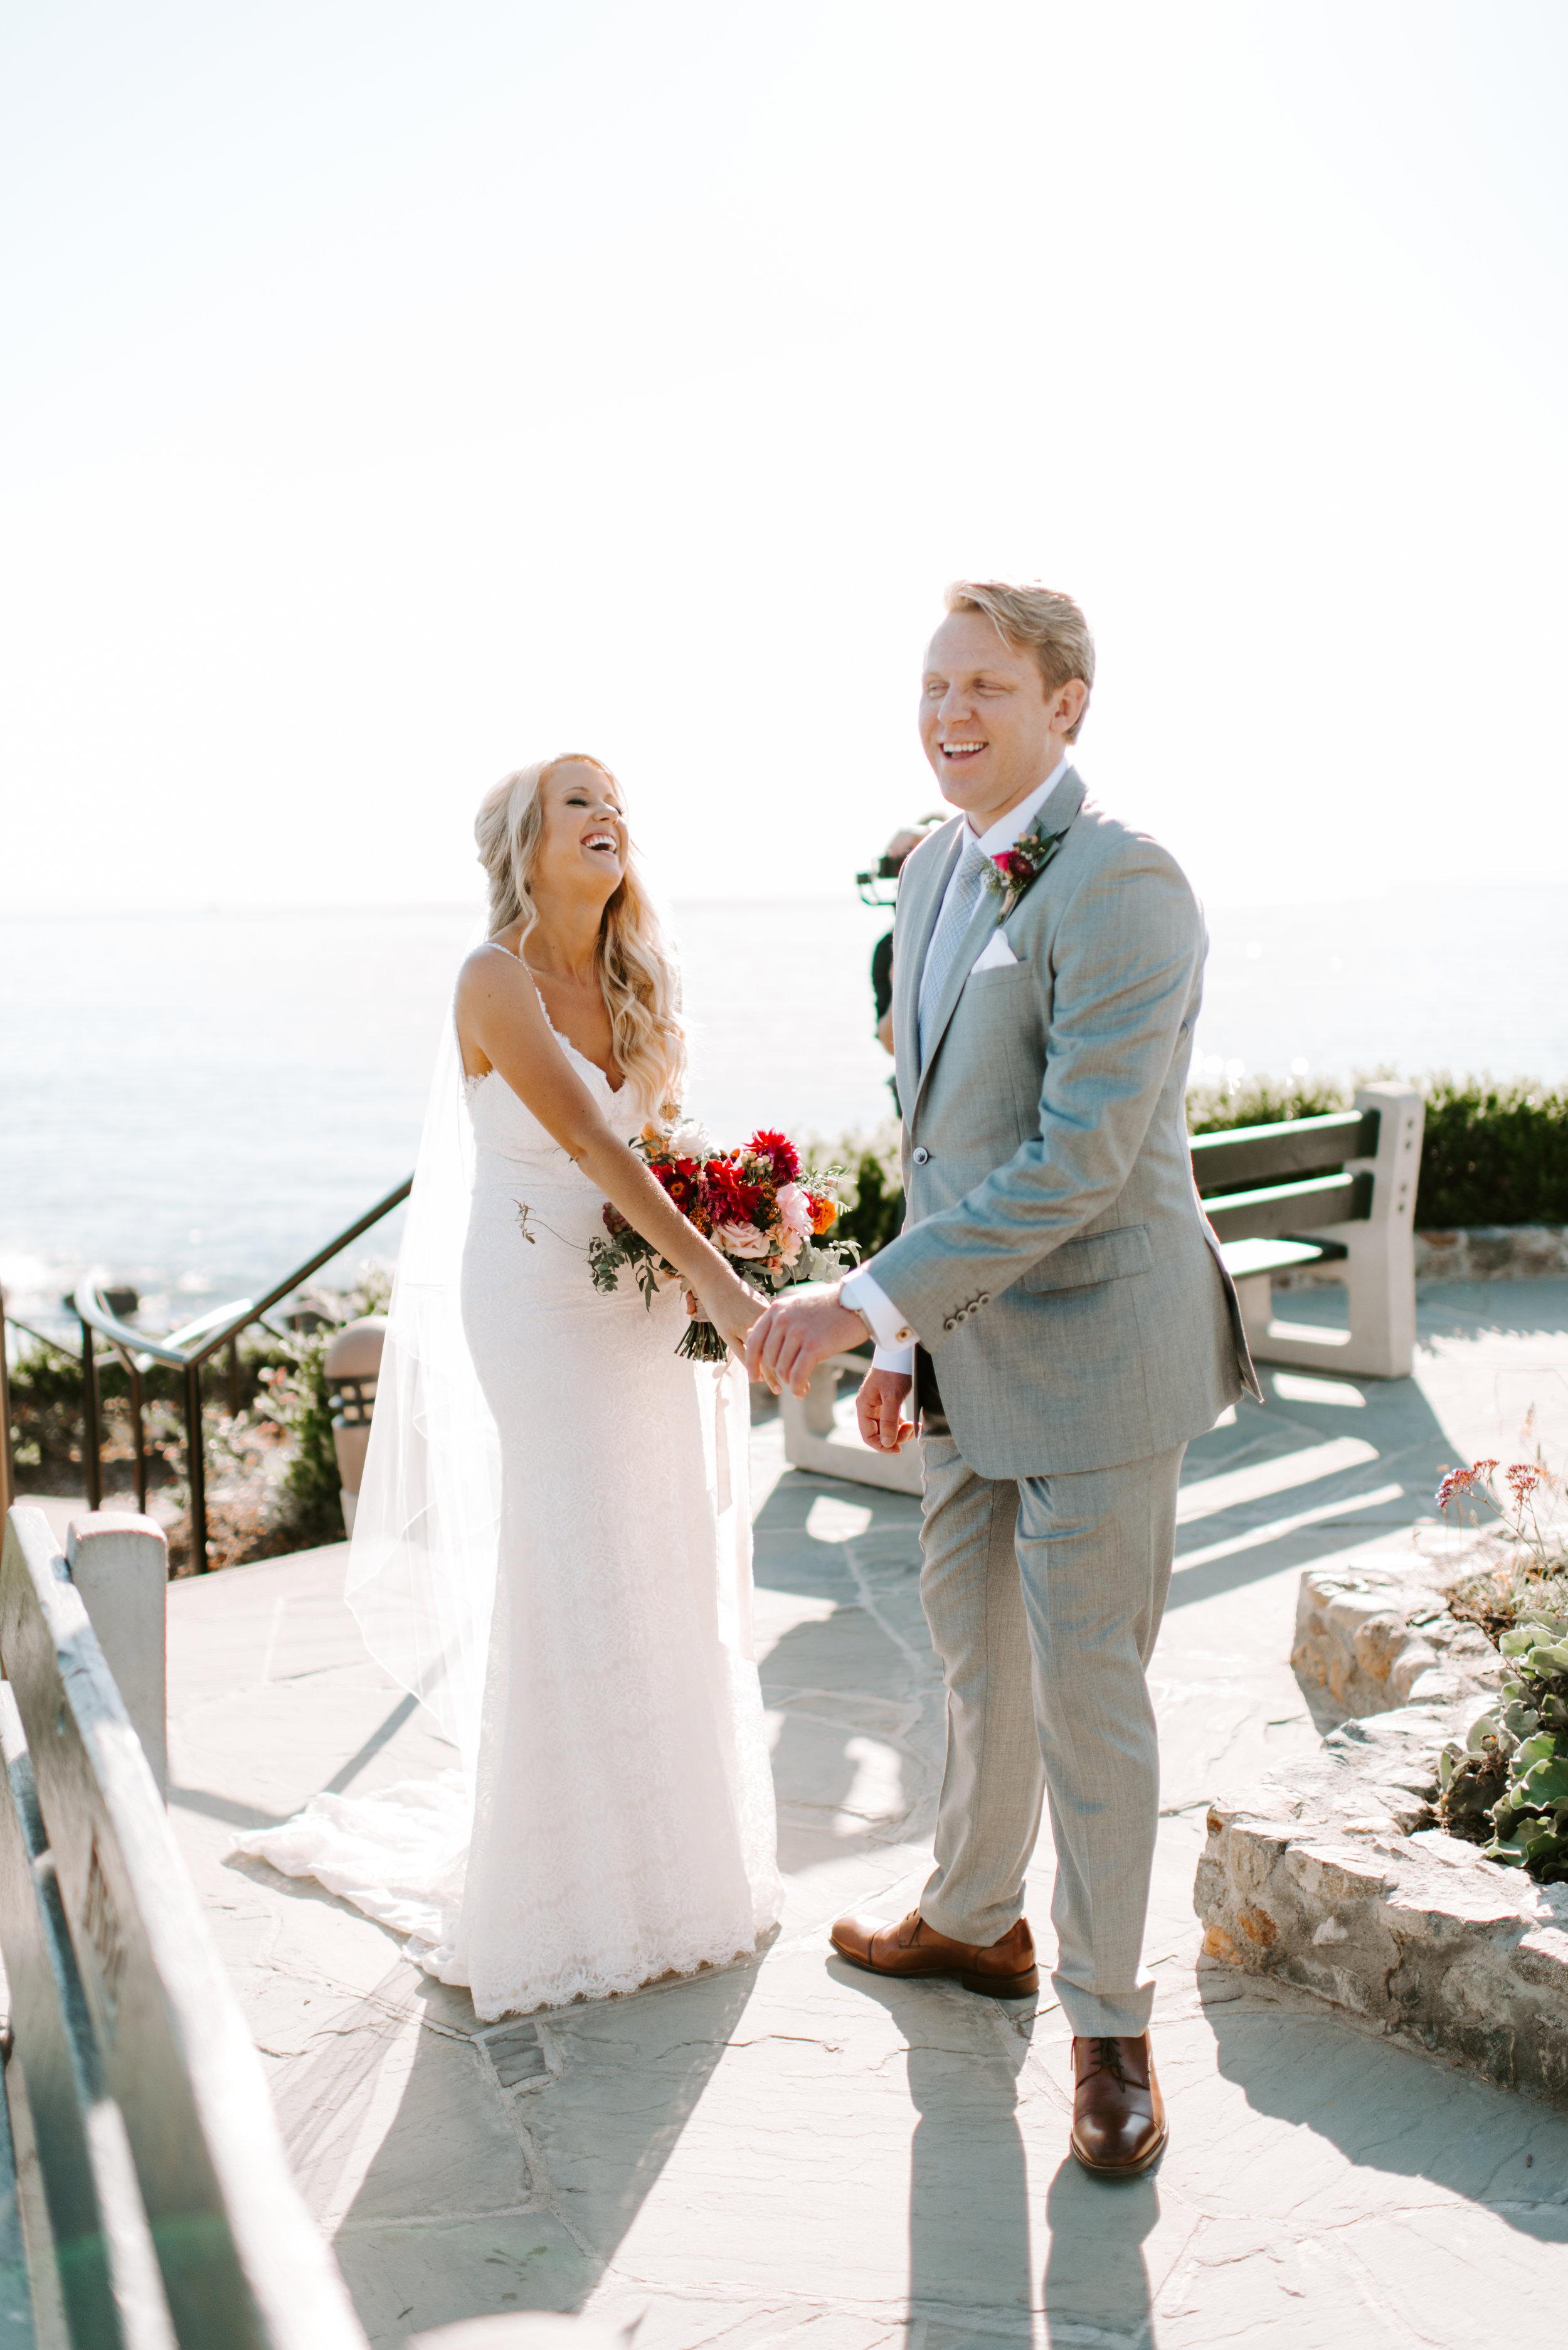 Wife surprises husband on wedding day